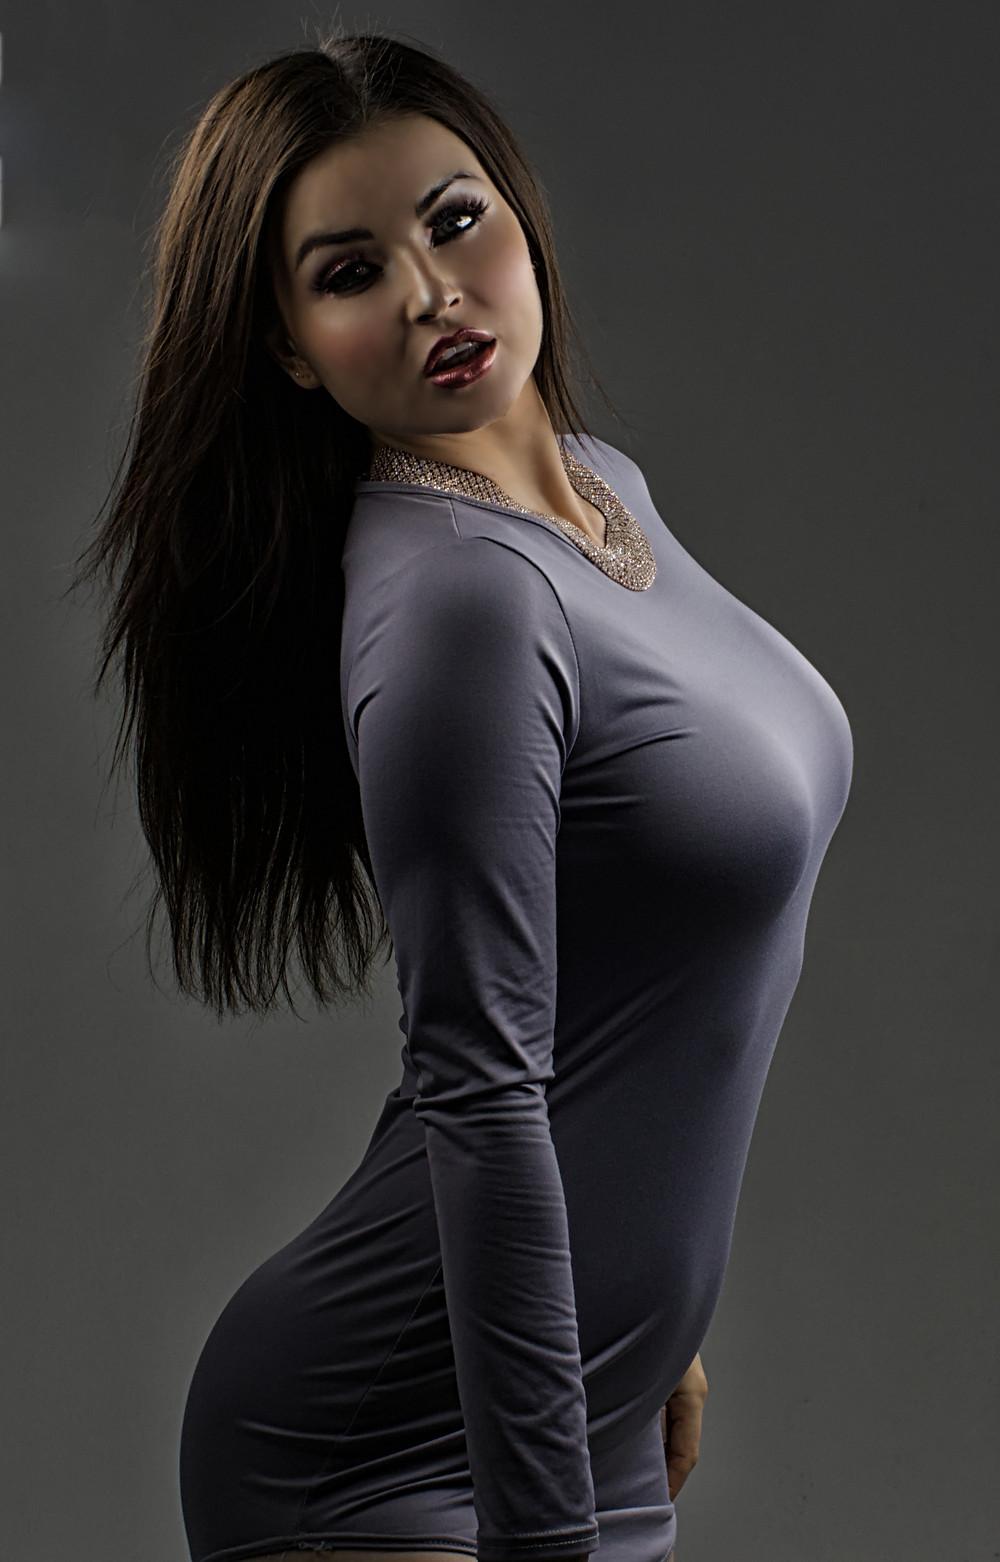 sexy model Veronica Lavery